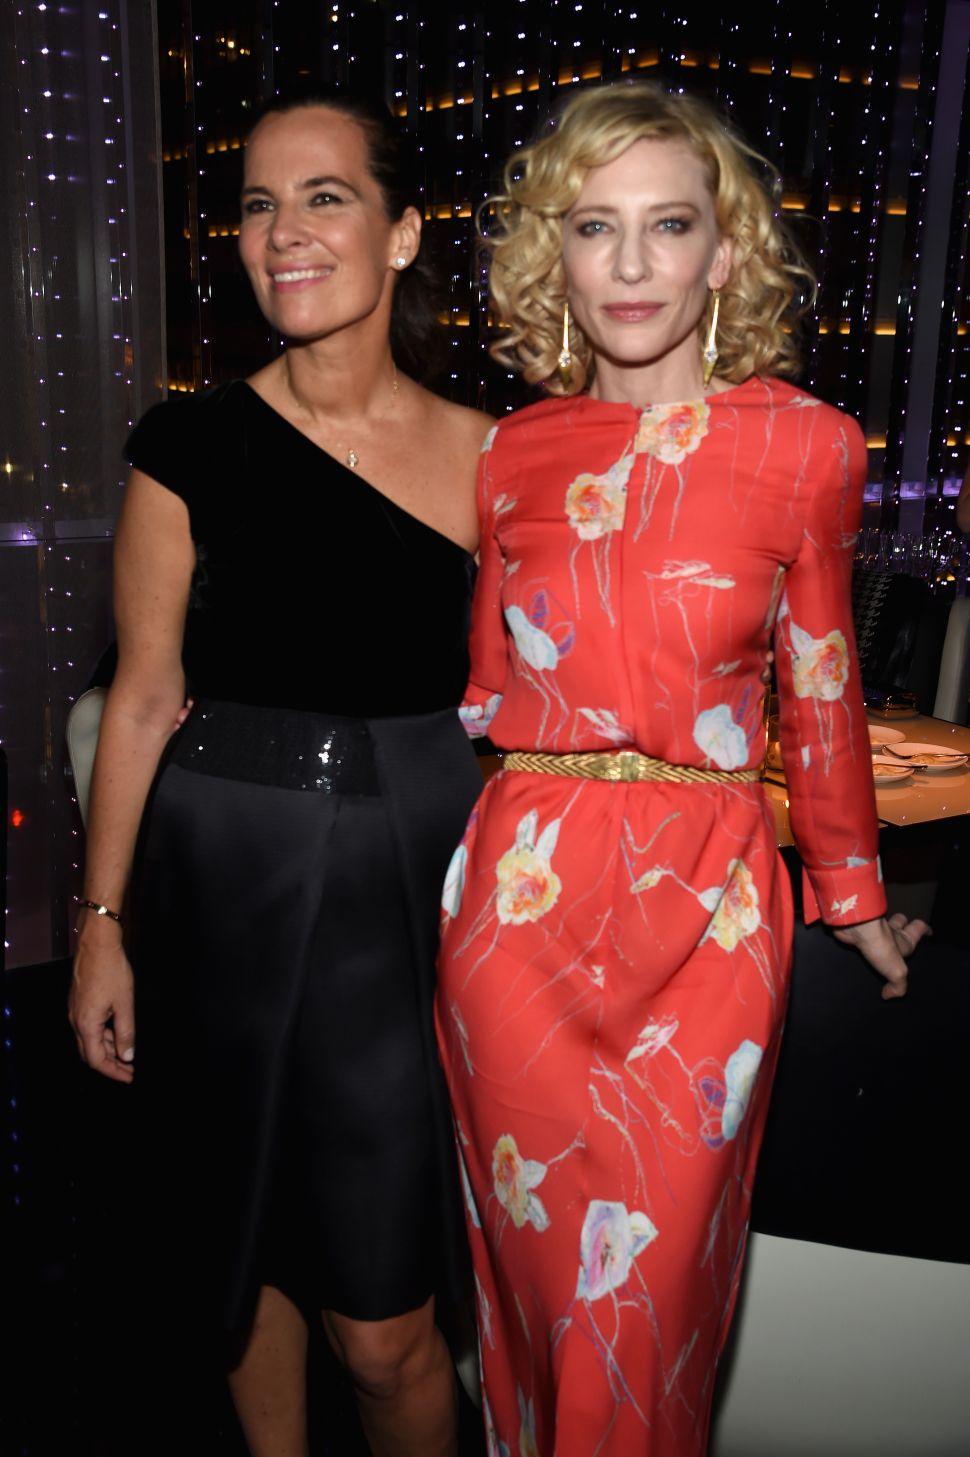 Roberta Armani, Cate Blanchett (Photo: Dimitrios Kambouris for Getty Images)